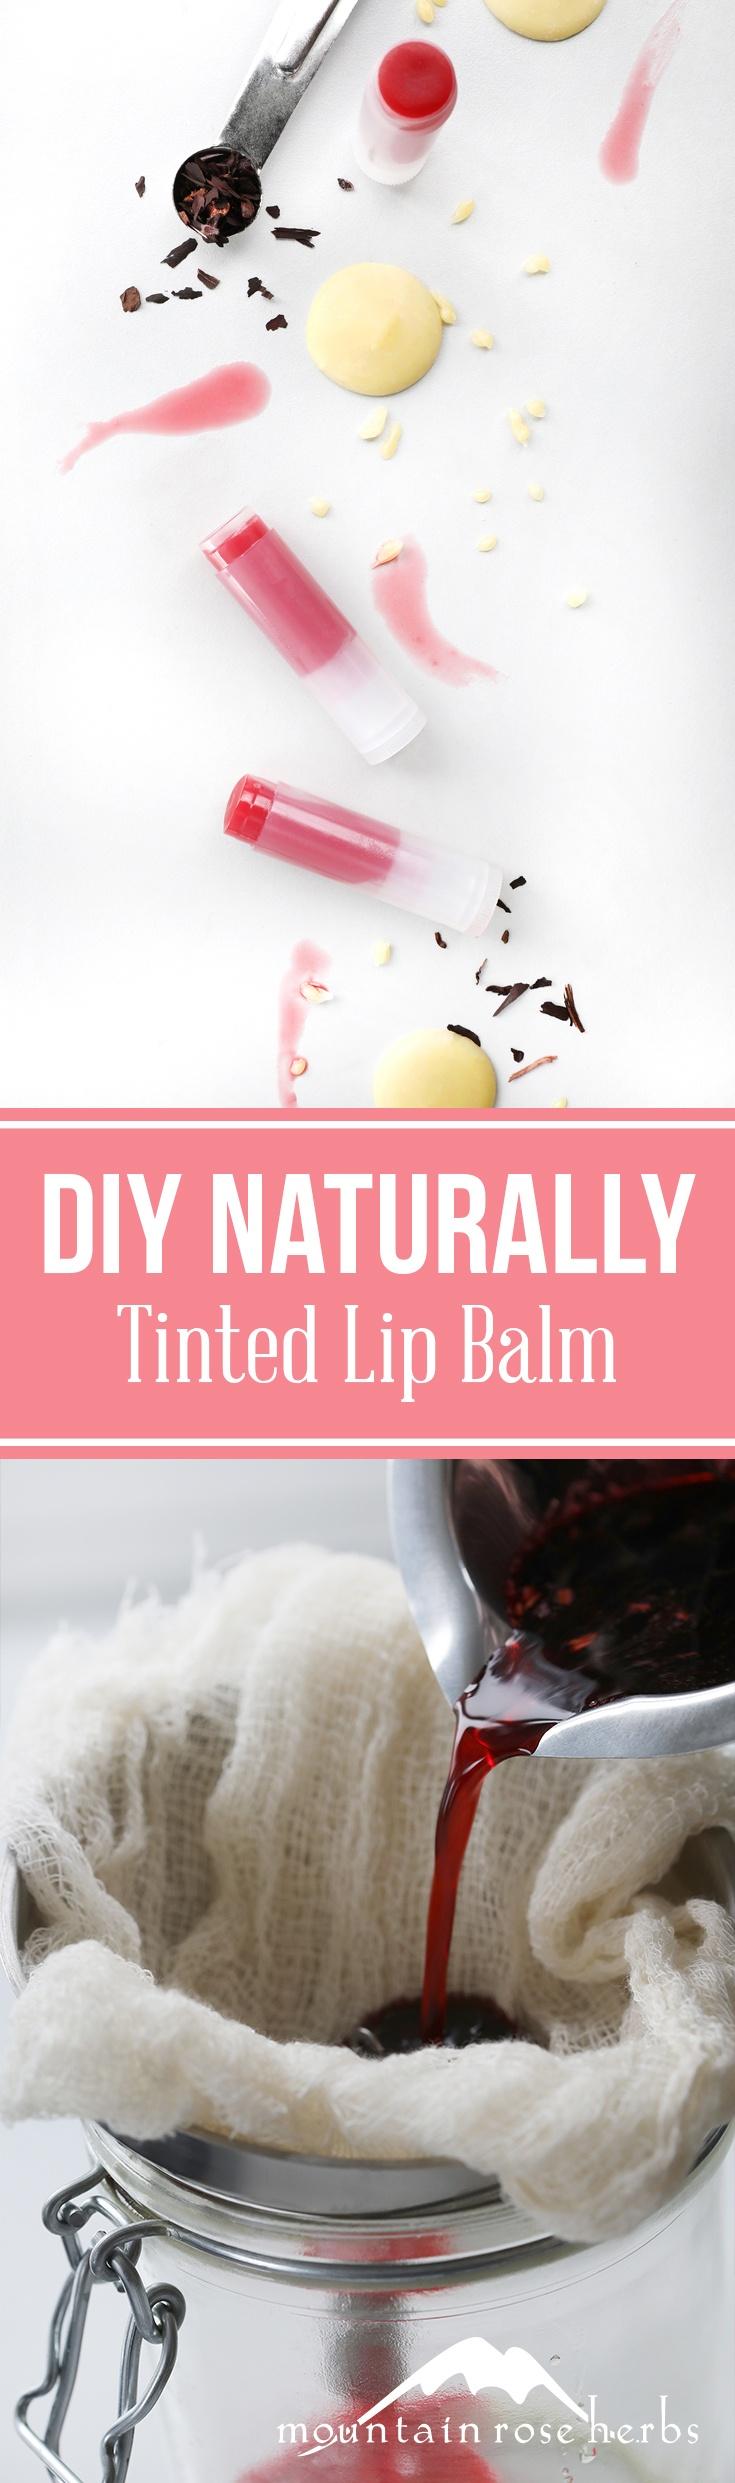 DIY Naturally Tinted Lip Balm Pin